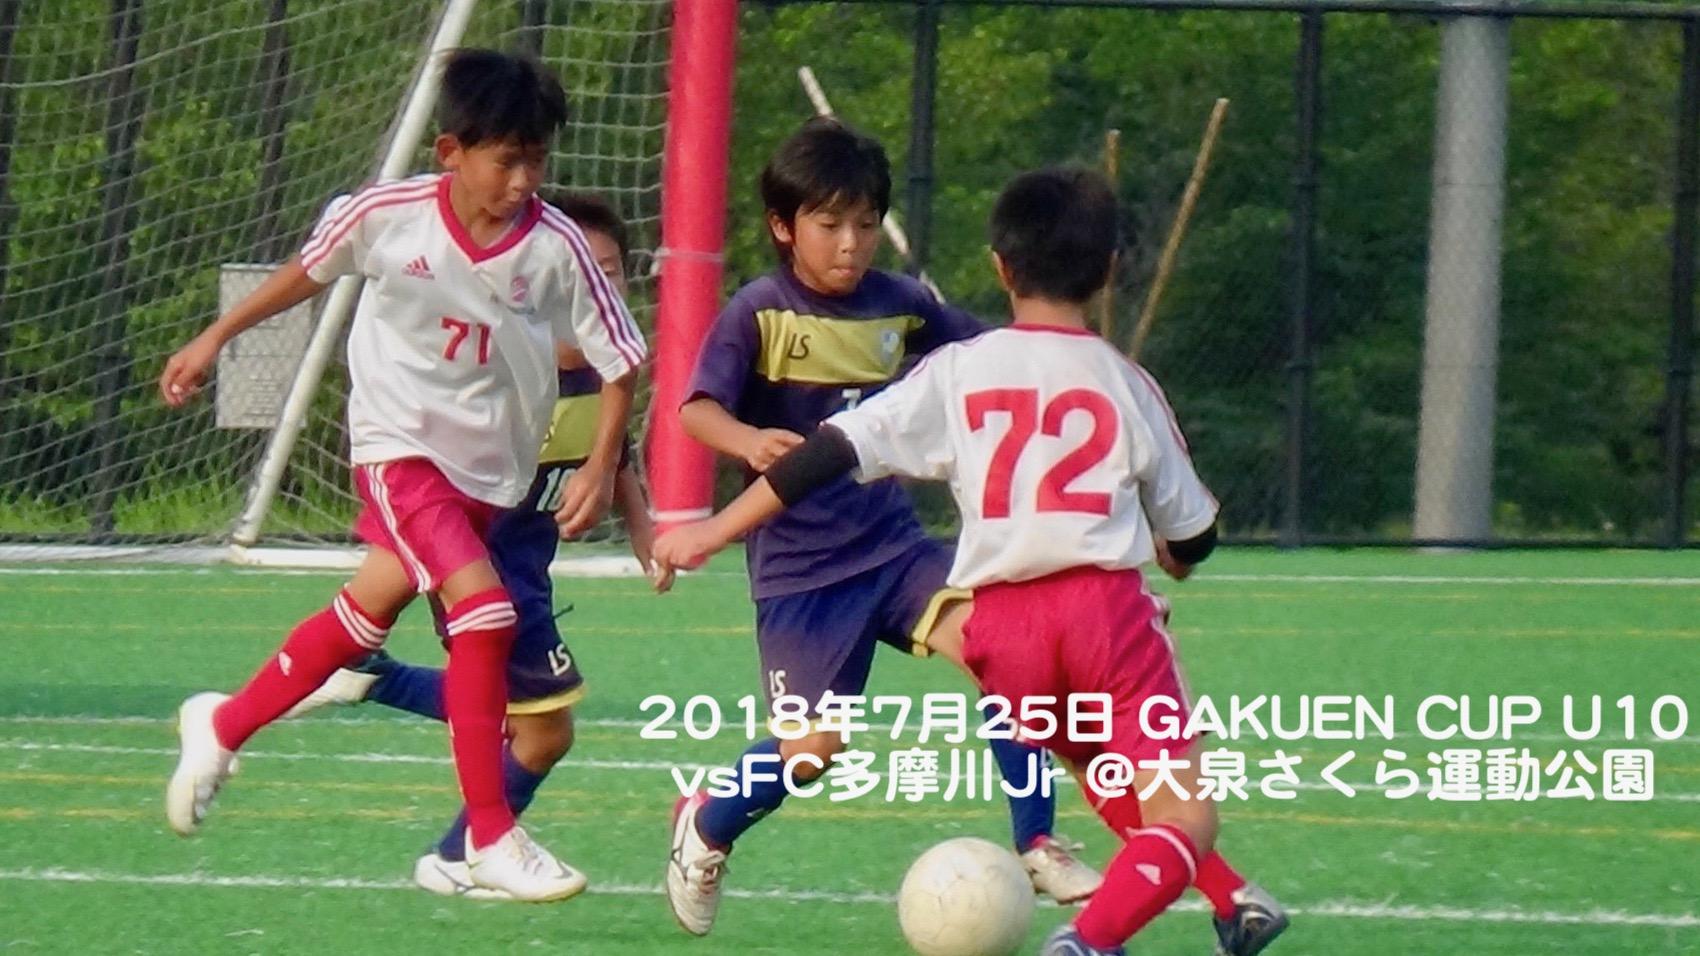 180725 U10GAKUEN CUP 多摩川Jr 2